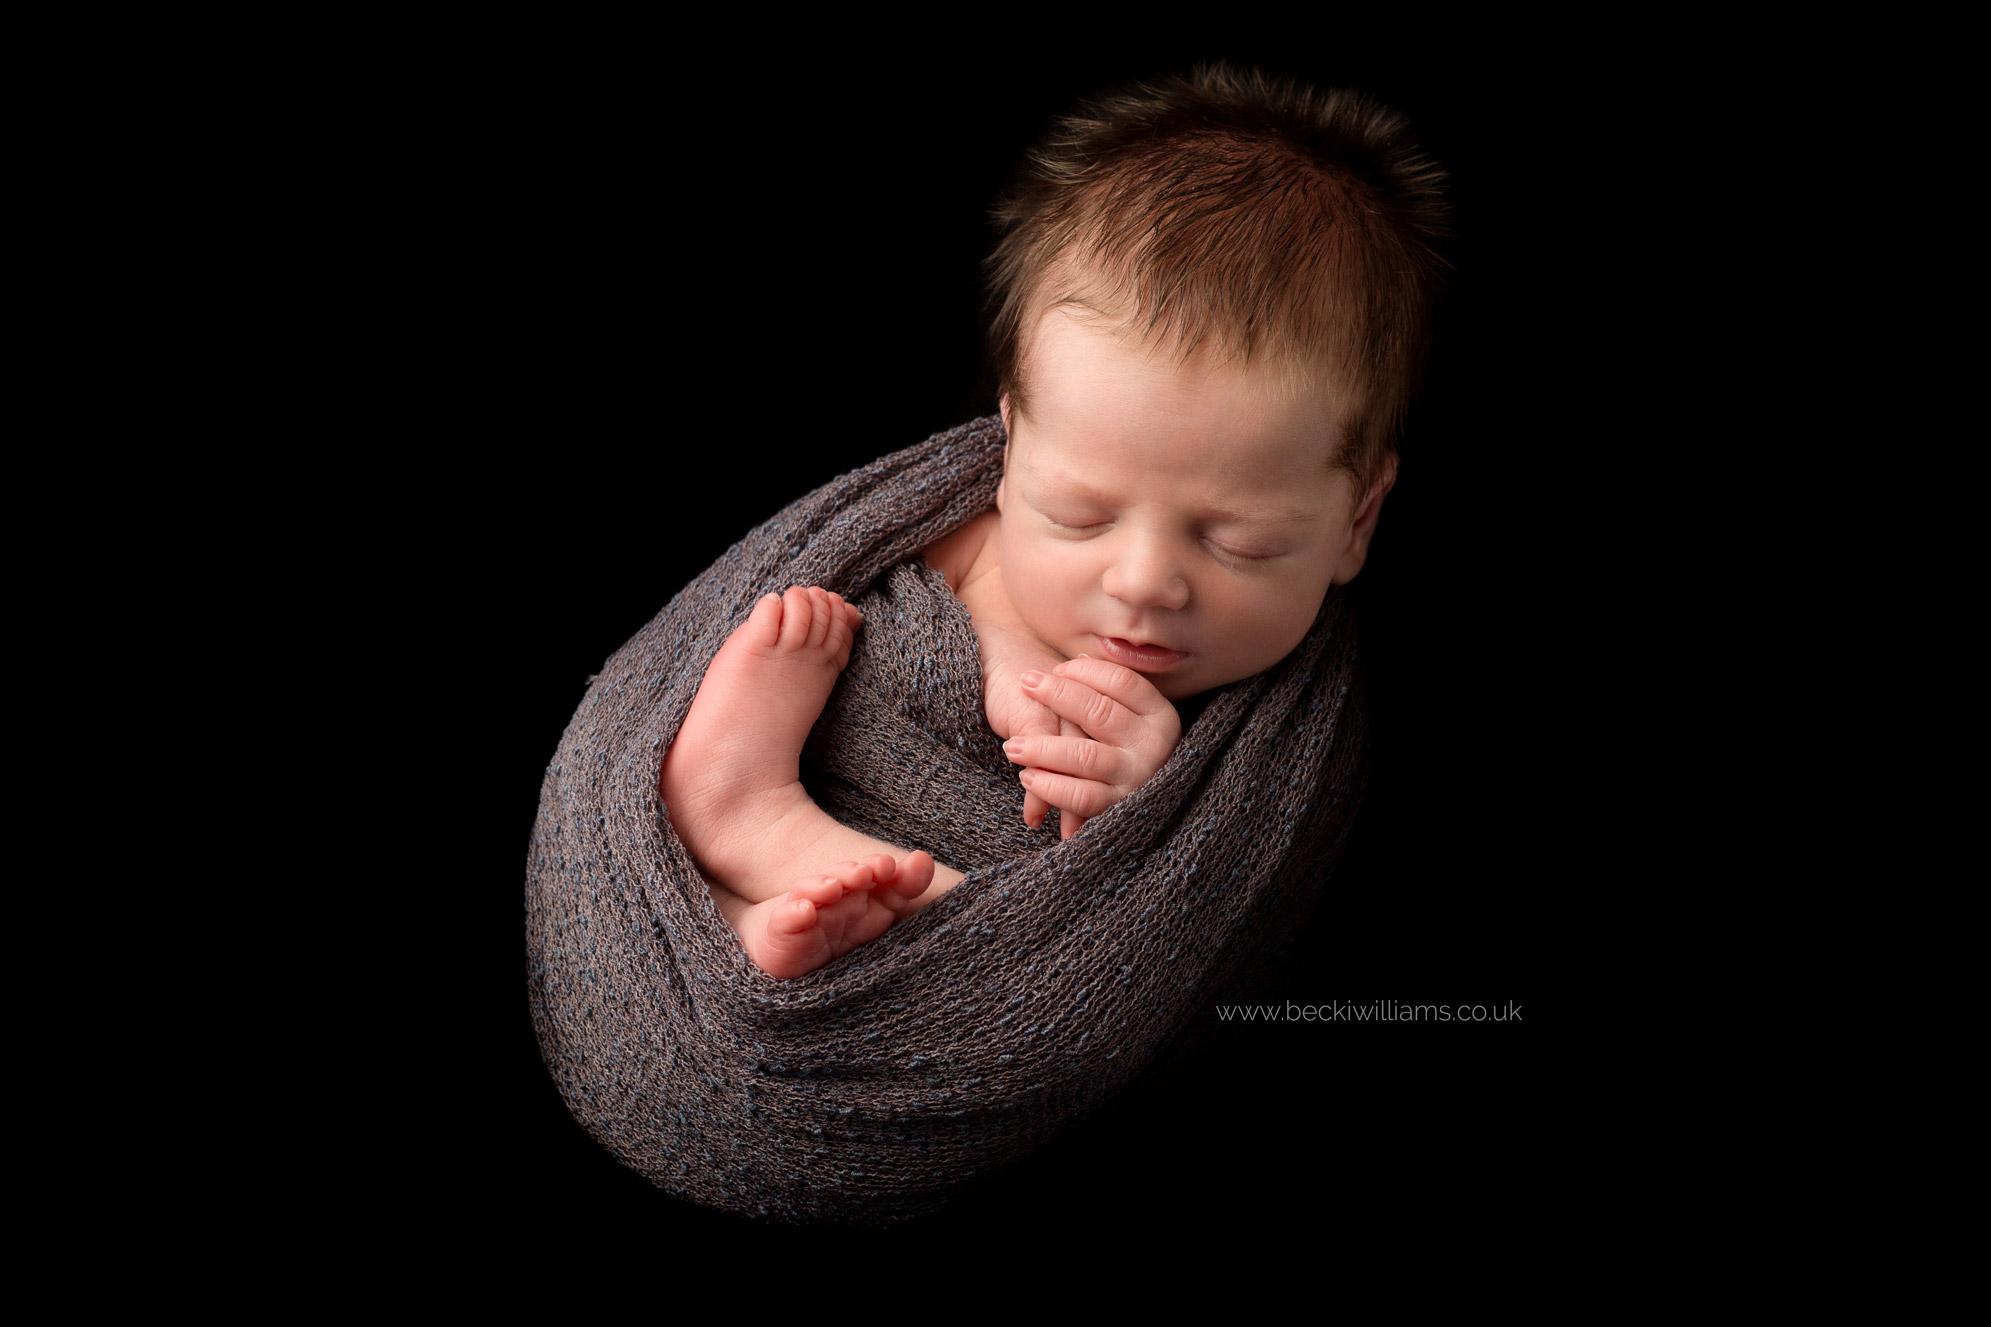 newborn-photography-st-albans-blac-grey-wrapped-simple.jpg